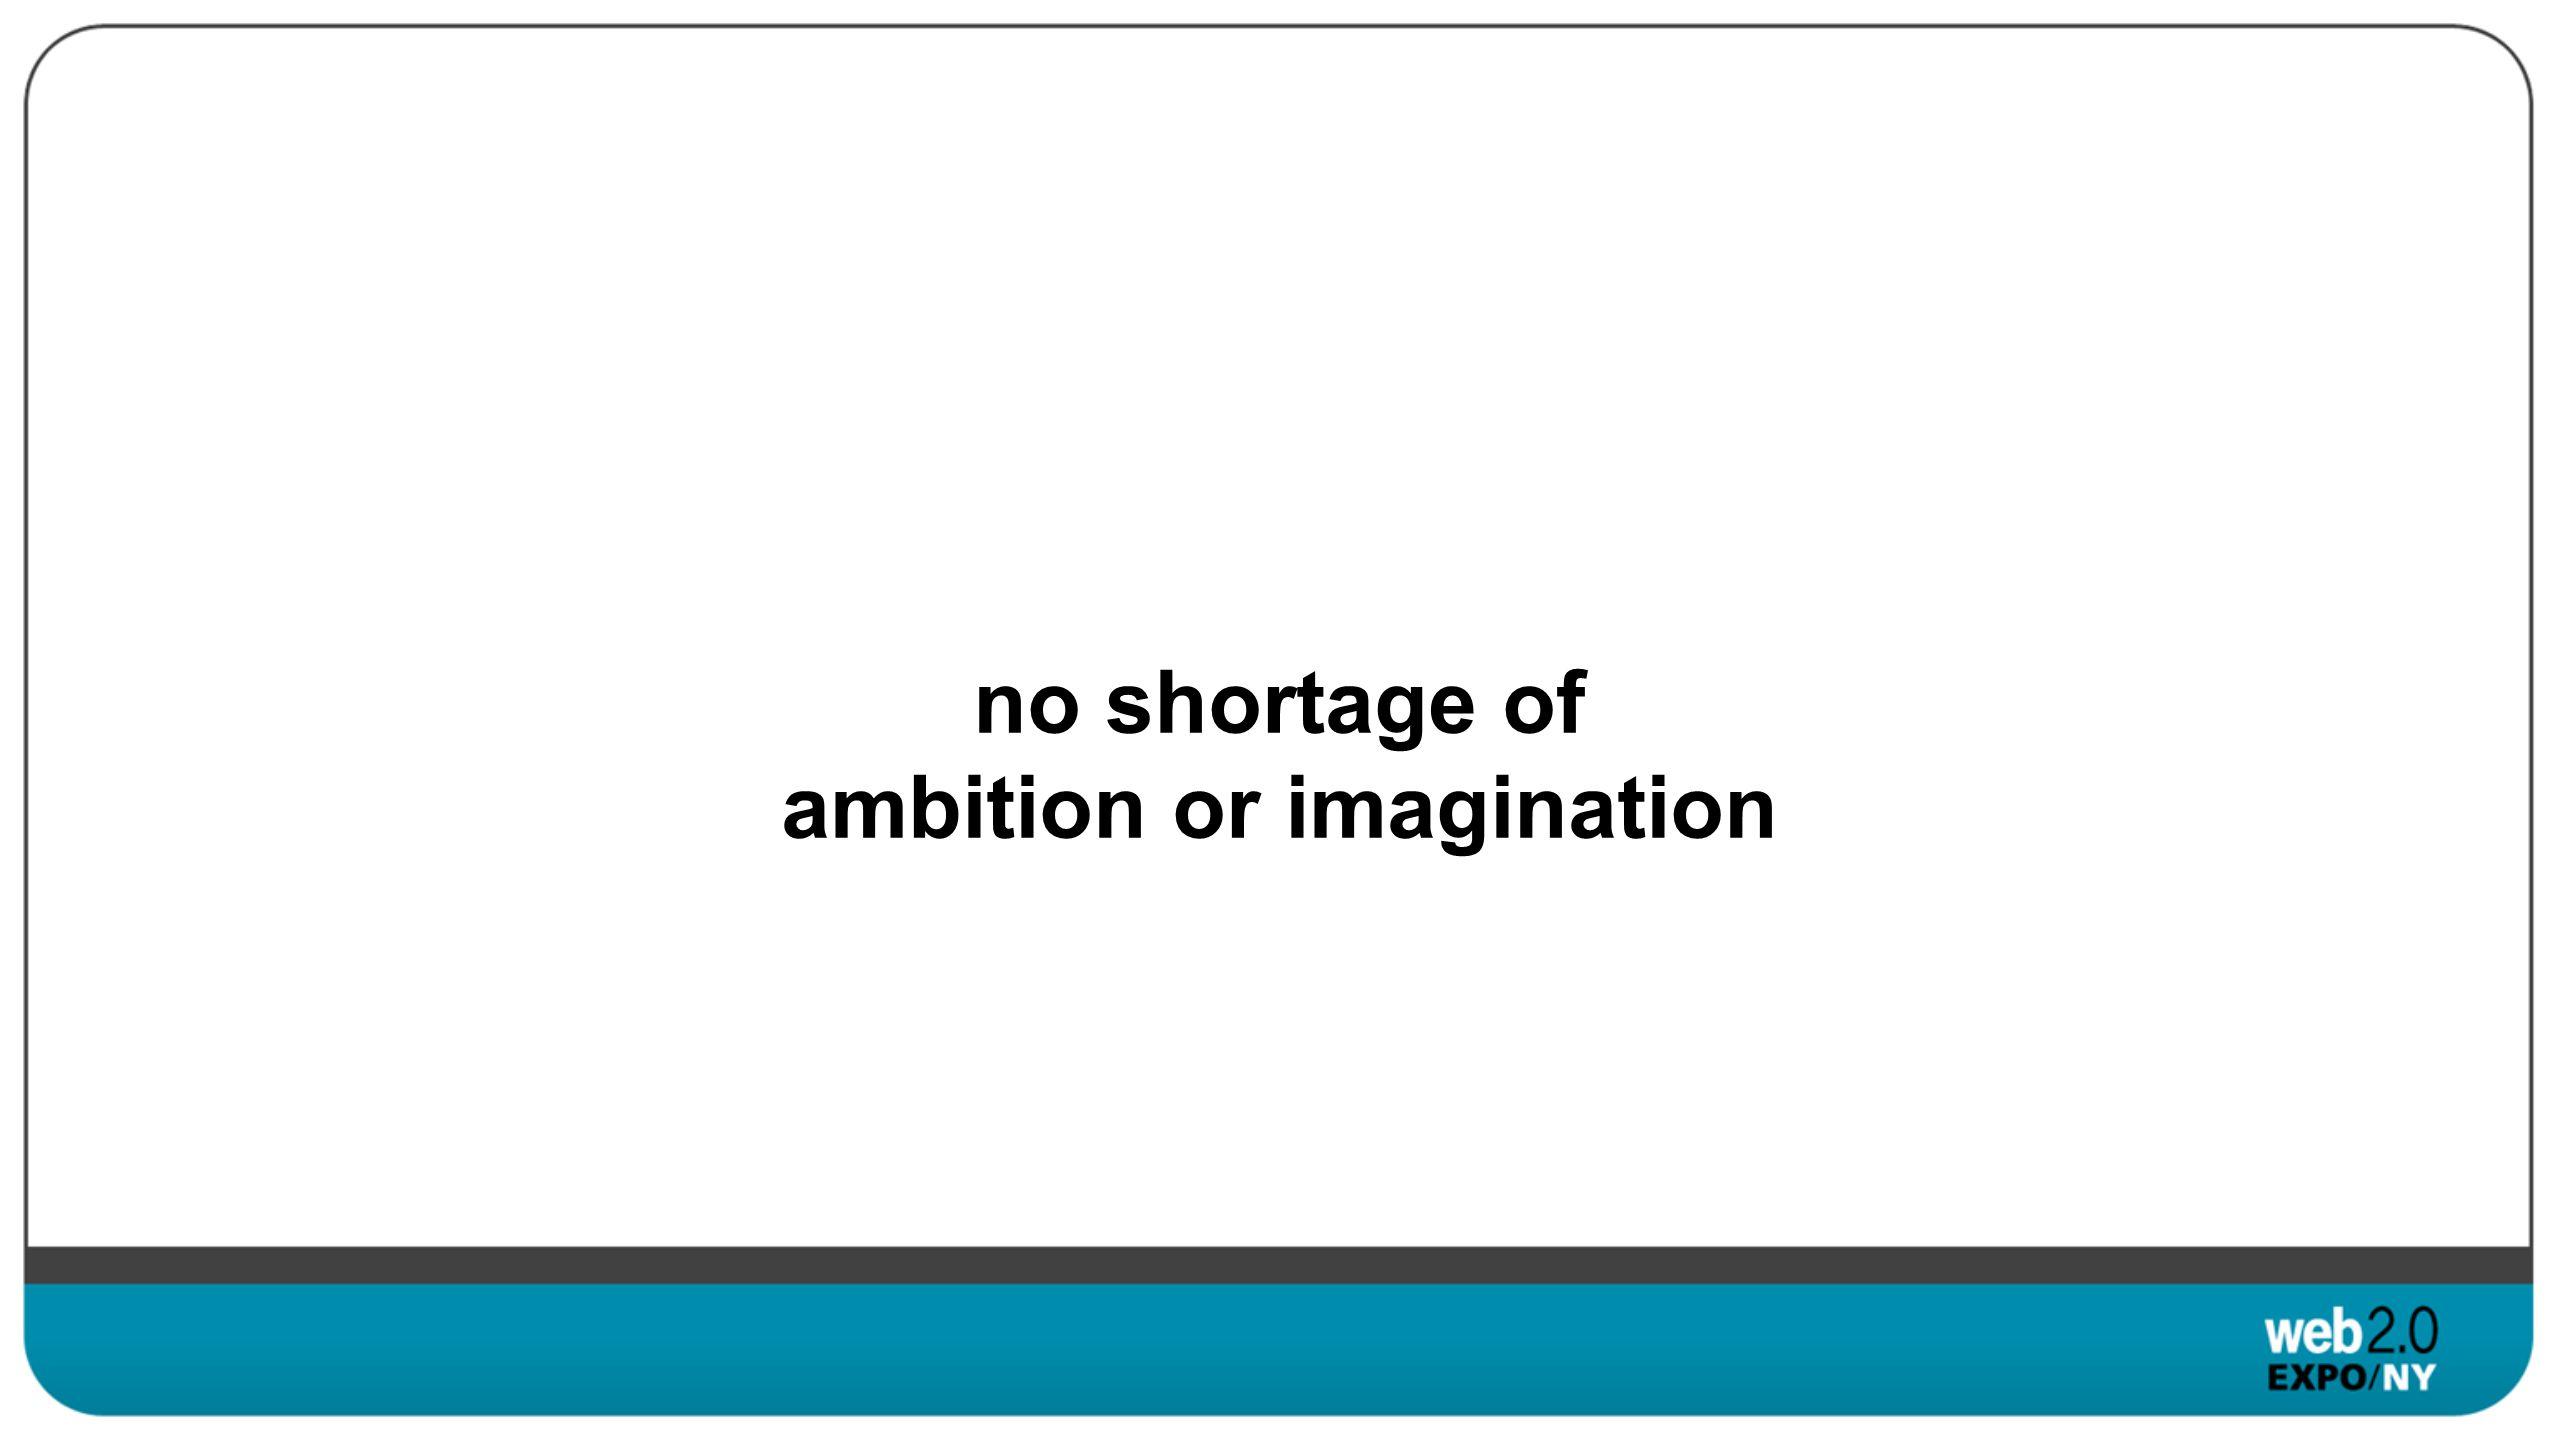 no shortage of ambition or imagination